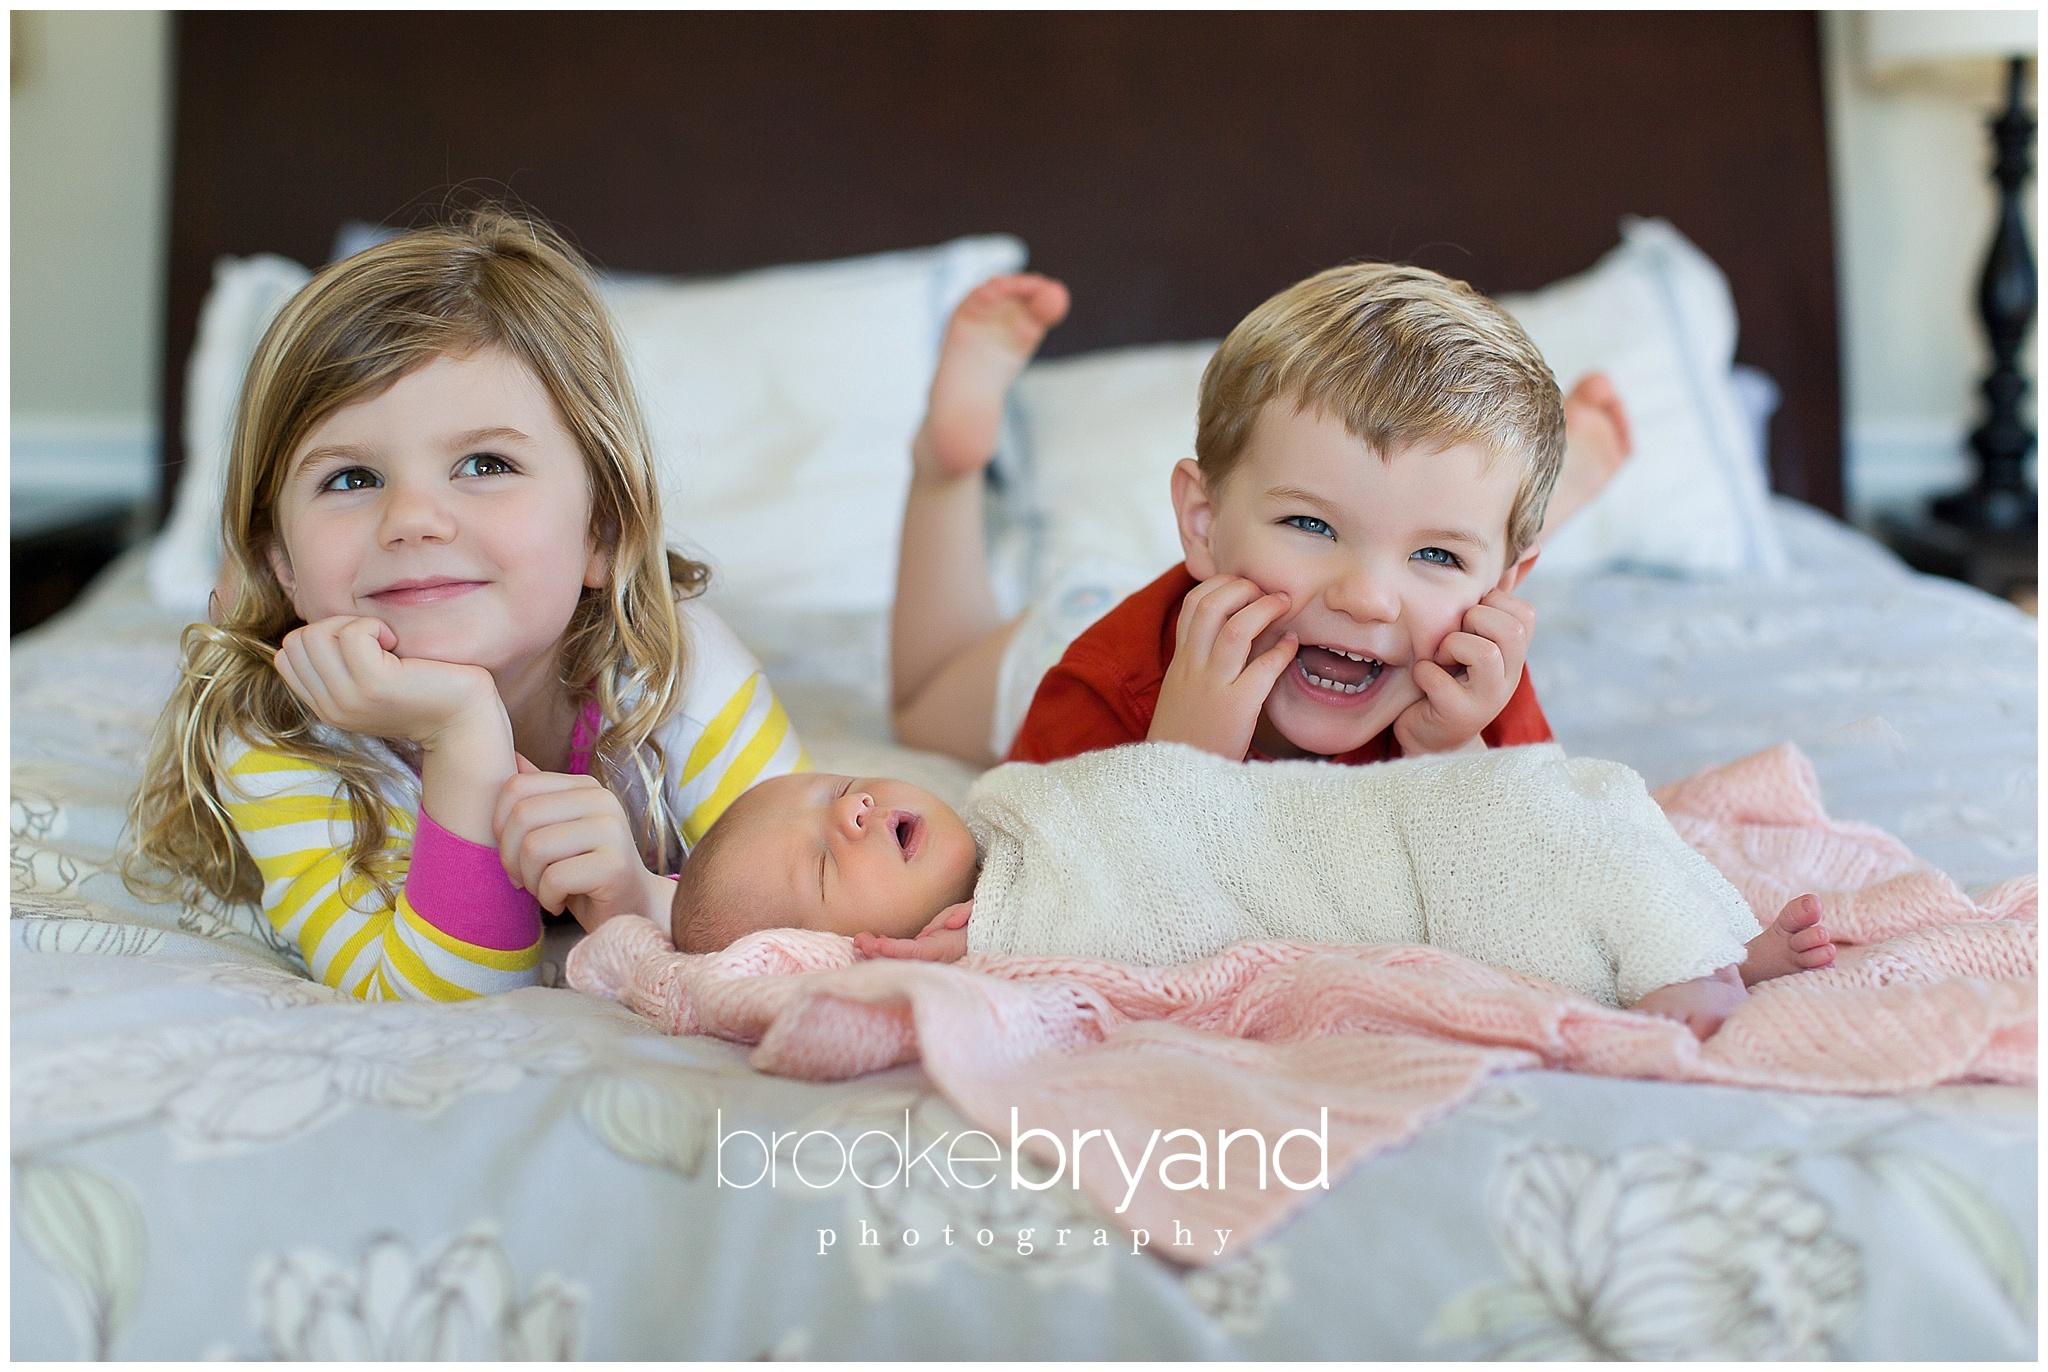 01.2015-hyer-newborn-BBP_3797_retouch1_San-Francisco-newborn-baby-photographer.jpg